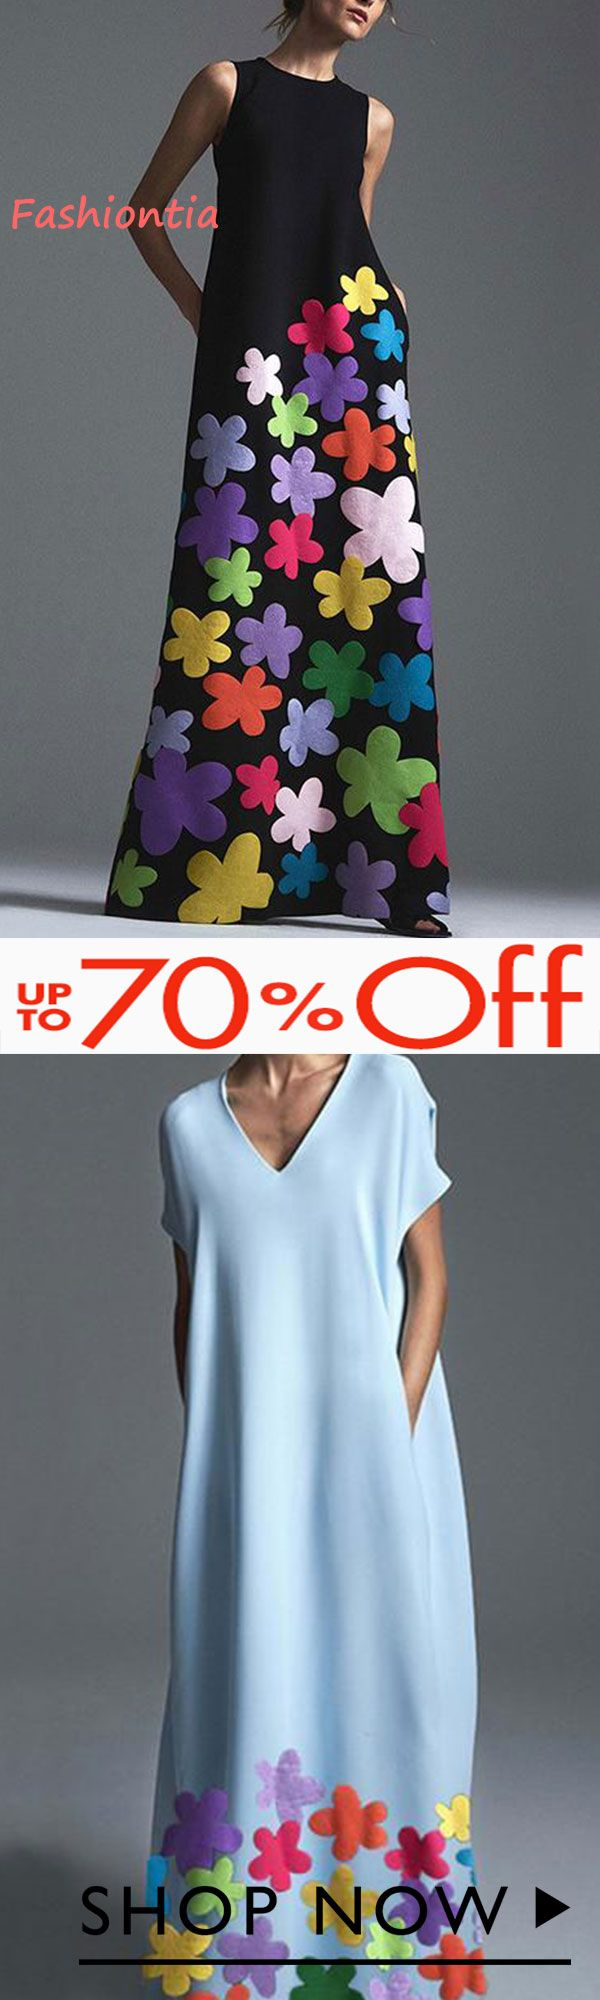 New Arrival!!  Fashion Round Collar Printing Maxi Dresses – Fashiontia